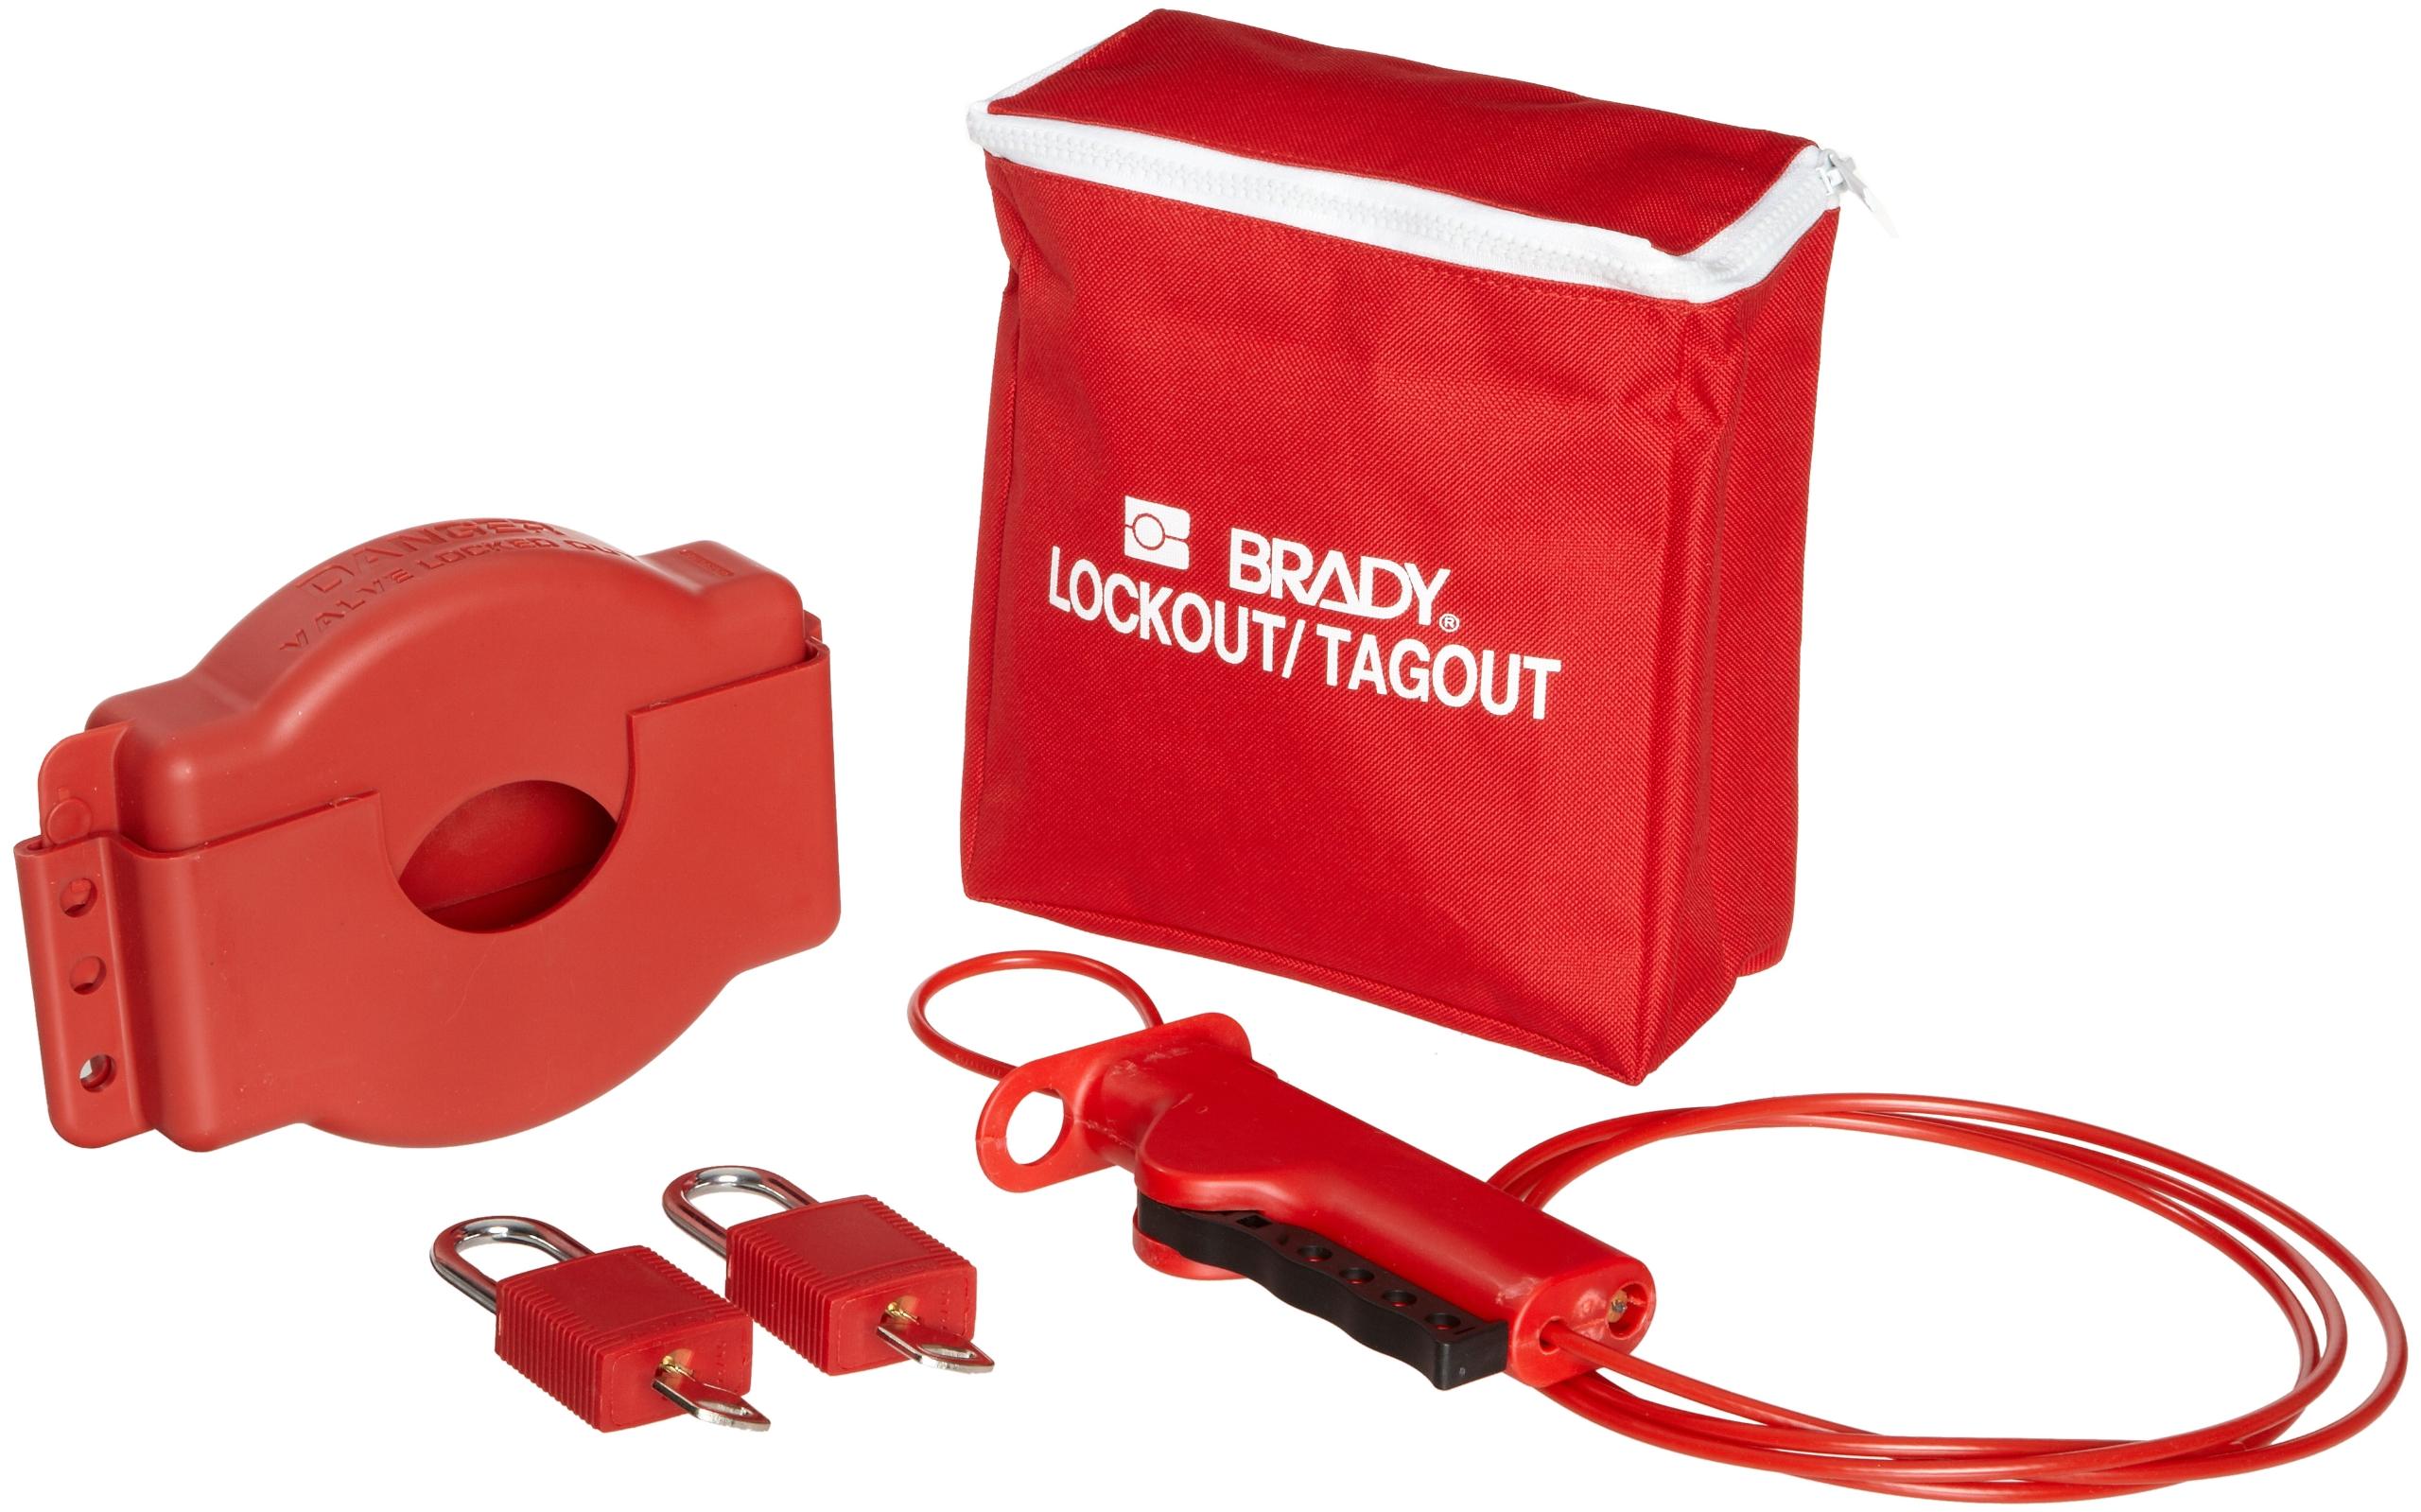 Brady Gate Valve Lockout Pouch Kit, Includes 2 Safety Padlocks and 2 Tags